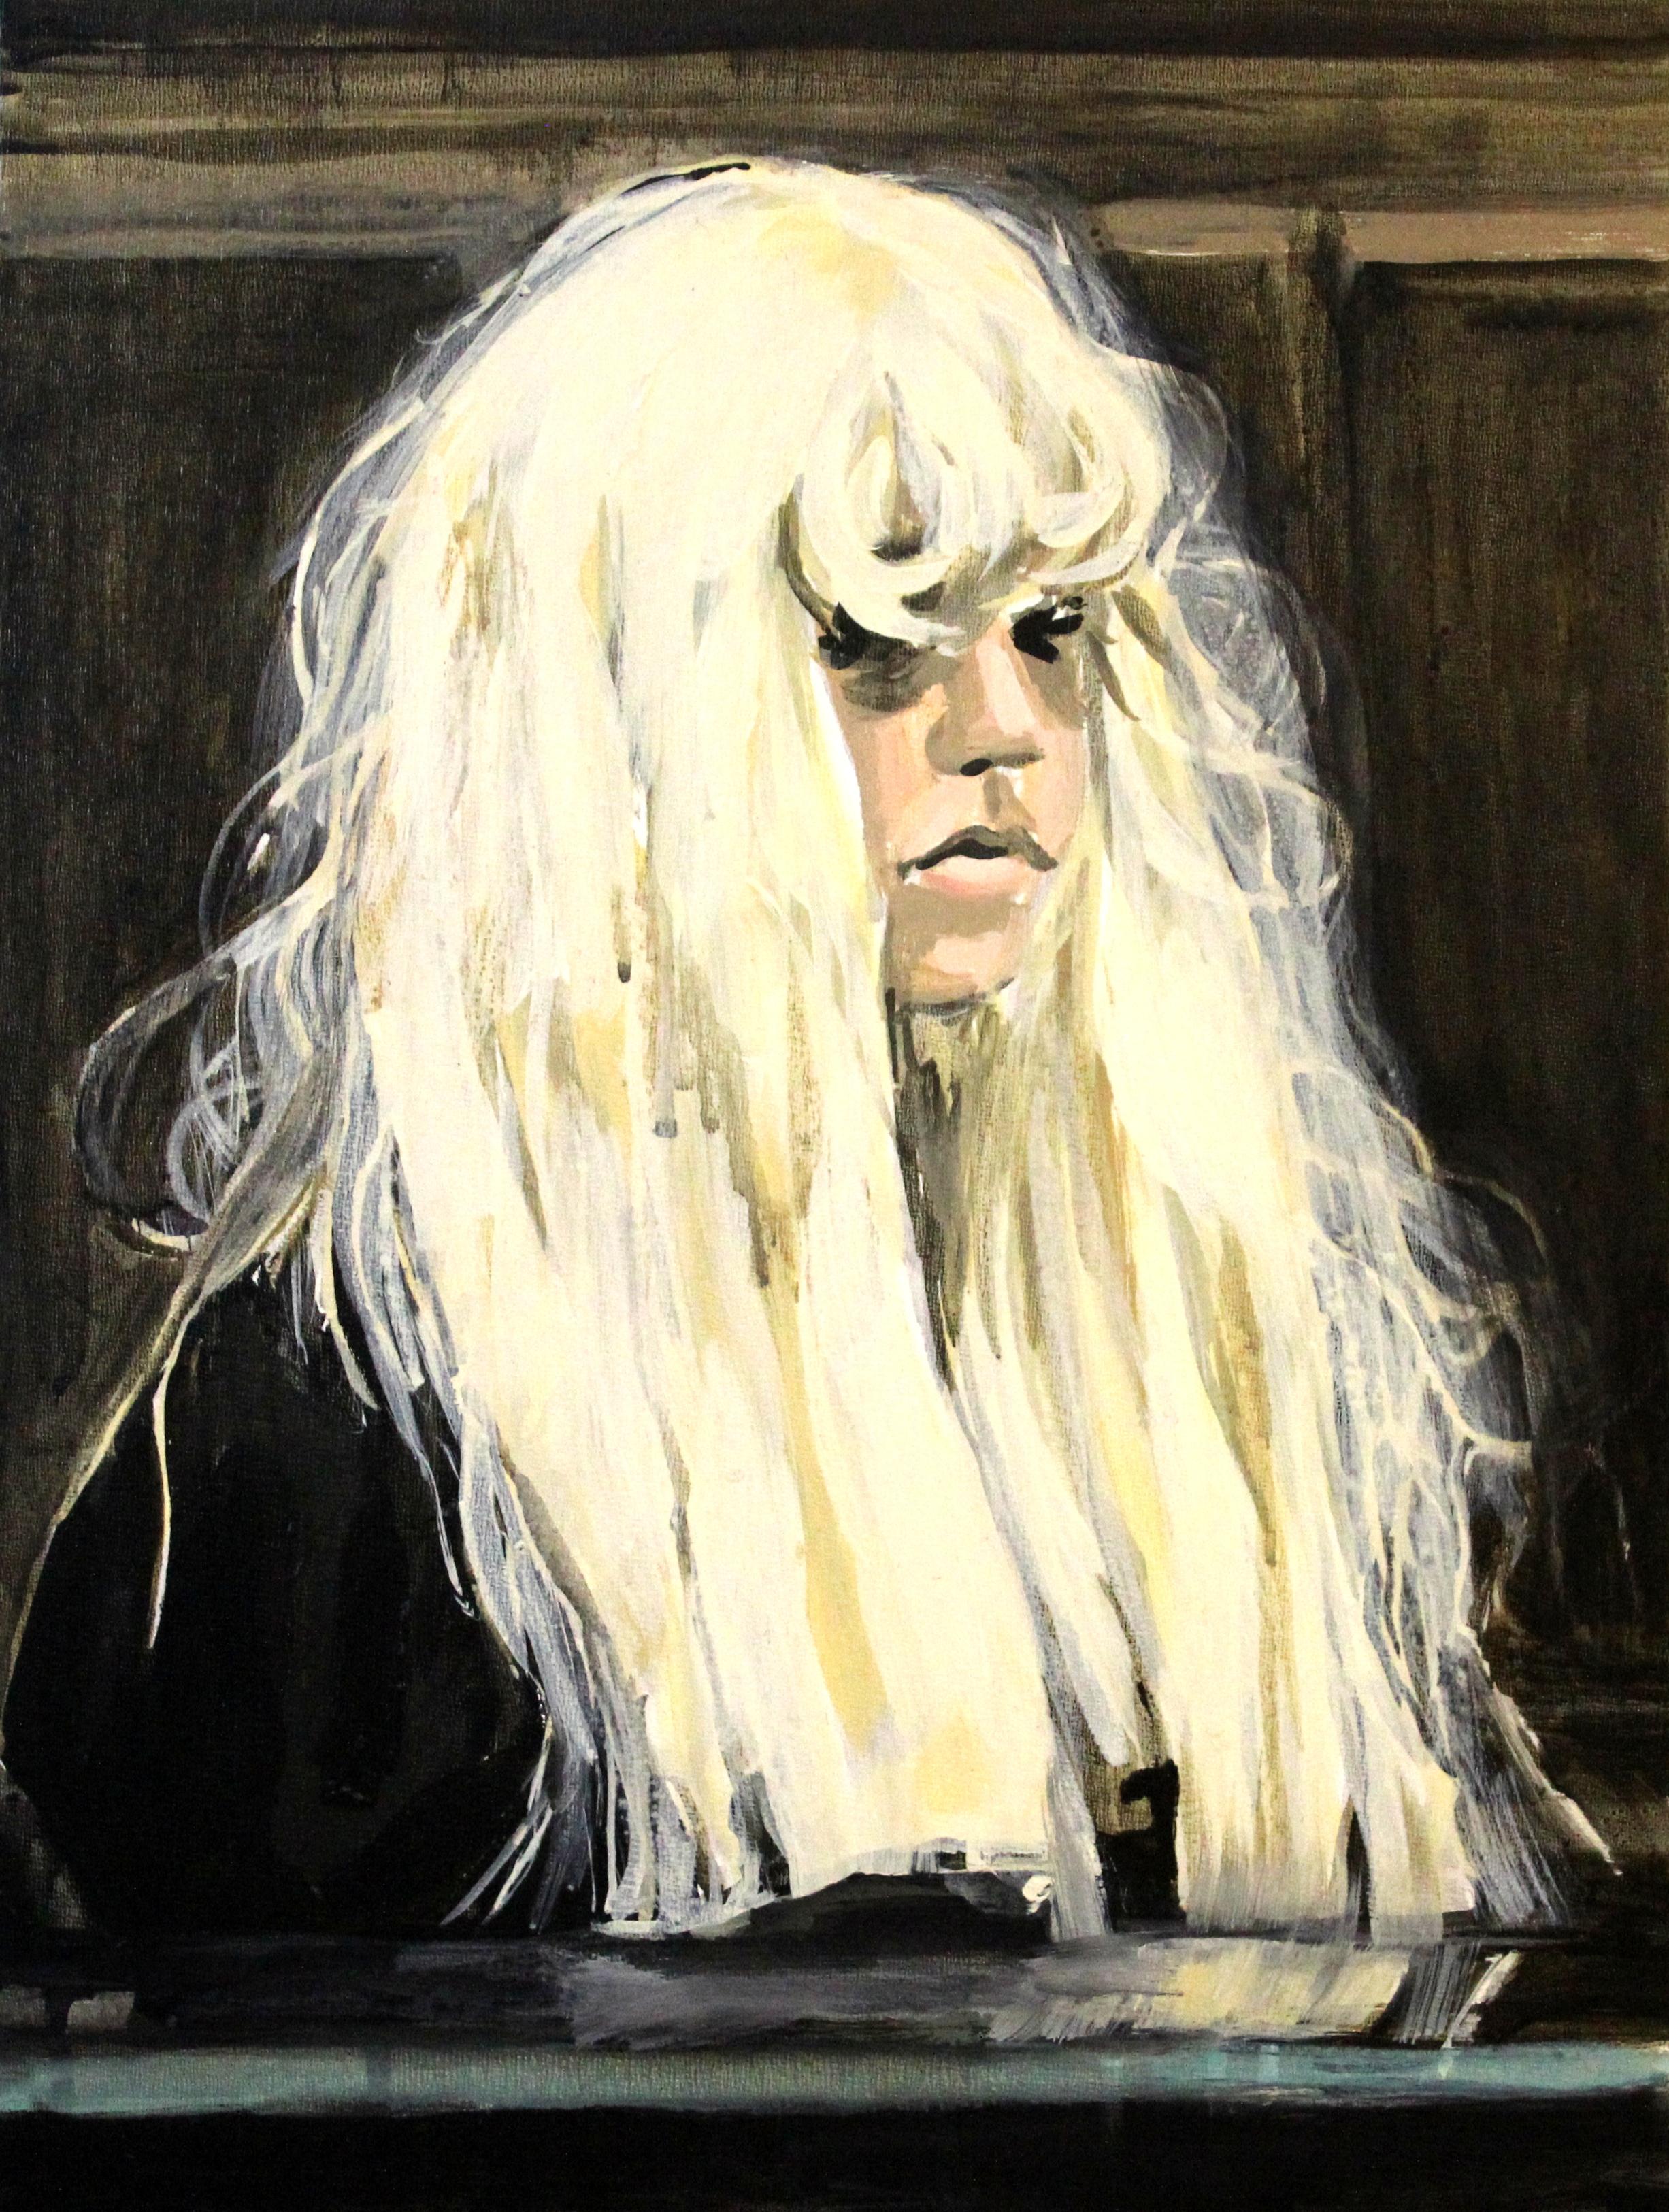 "Amanda Bynes Wearing a Wig in Court   12"" x 16"" acrylic on panel"